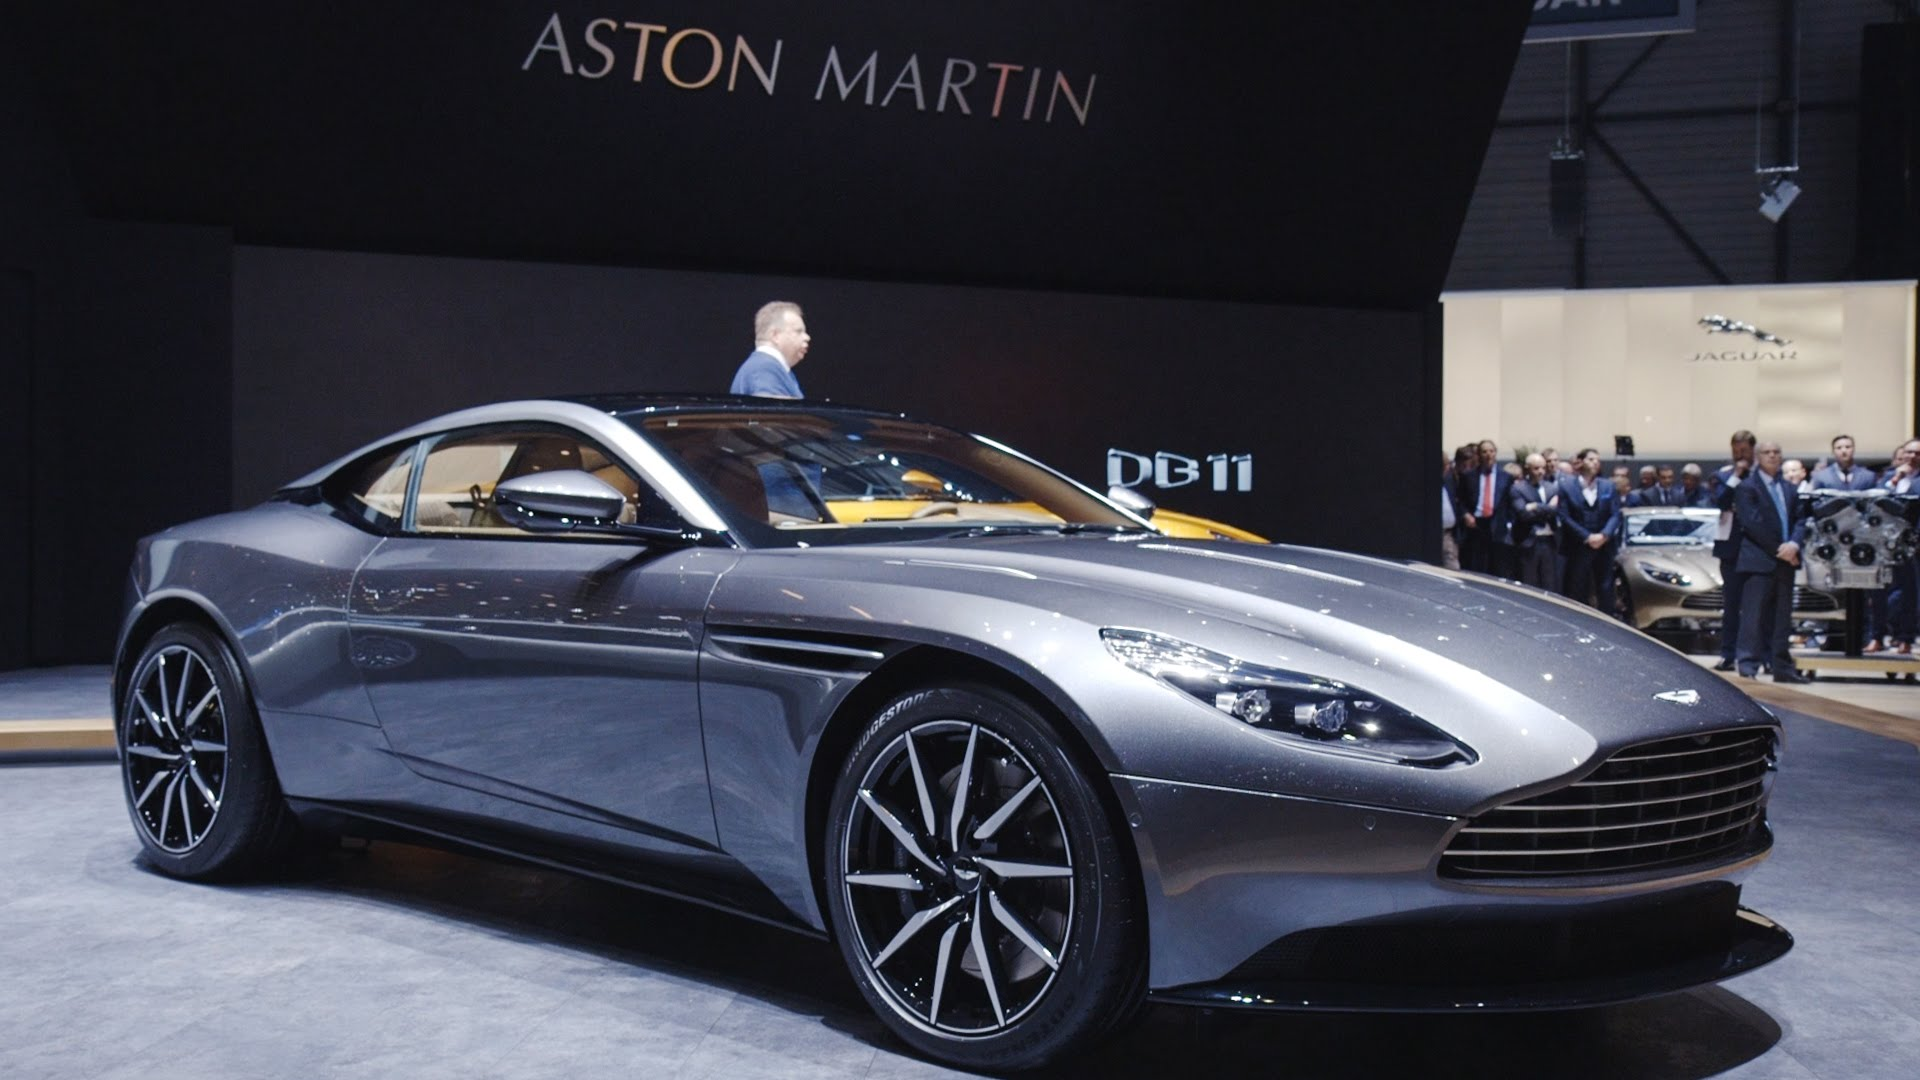 Aston Martin Db11 Hd Wallpapers 7wallpapers Net